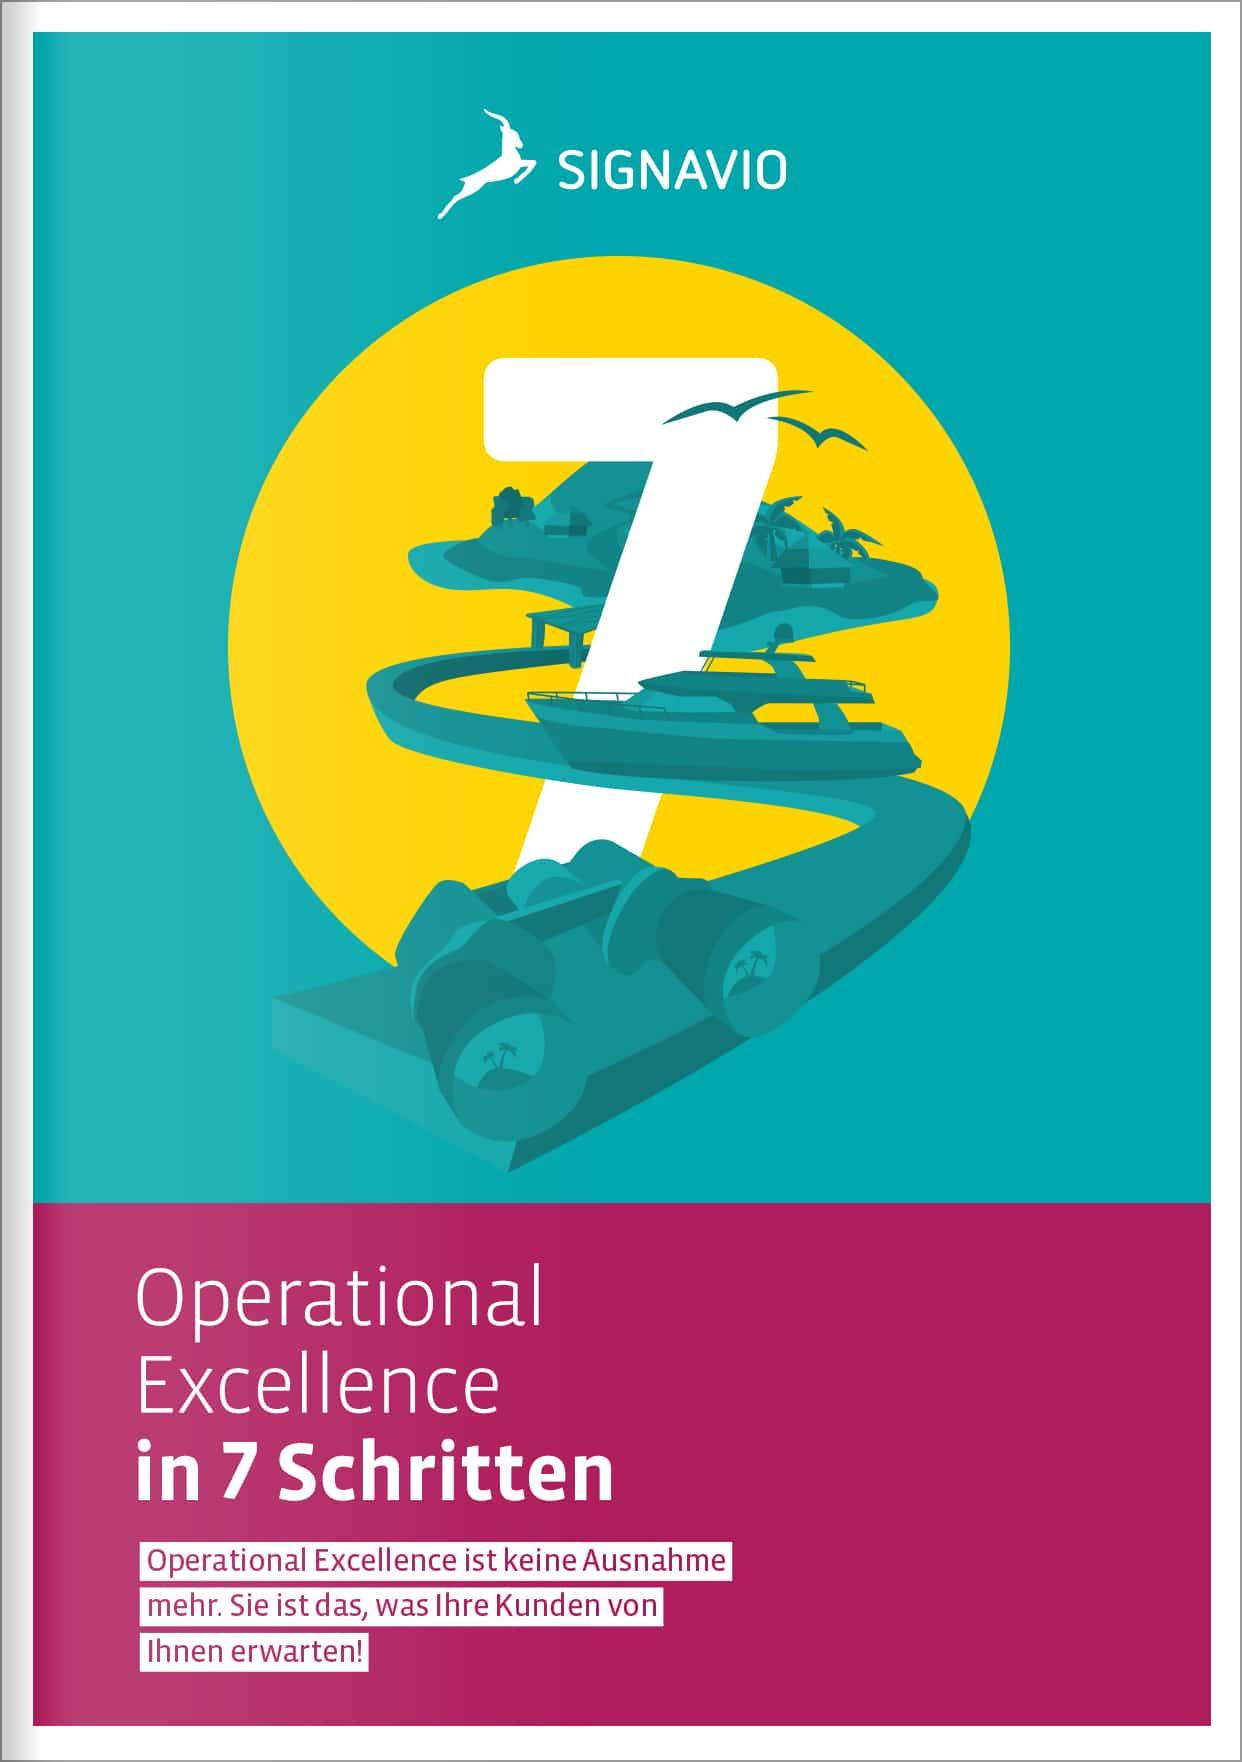 Operational Excellence in 7 Schritten